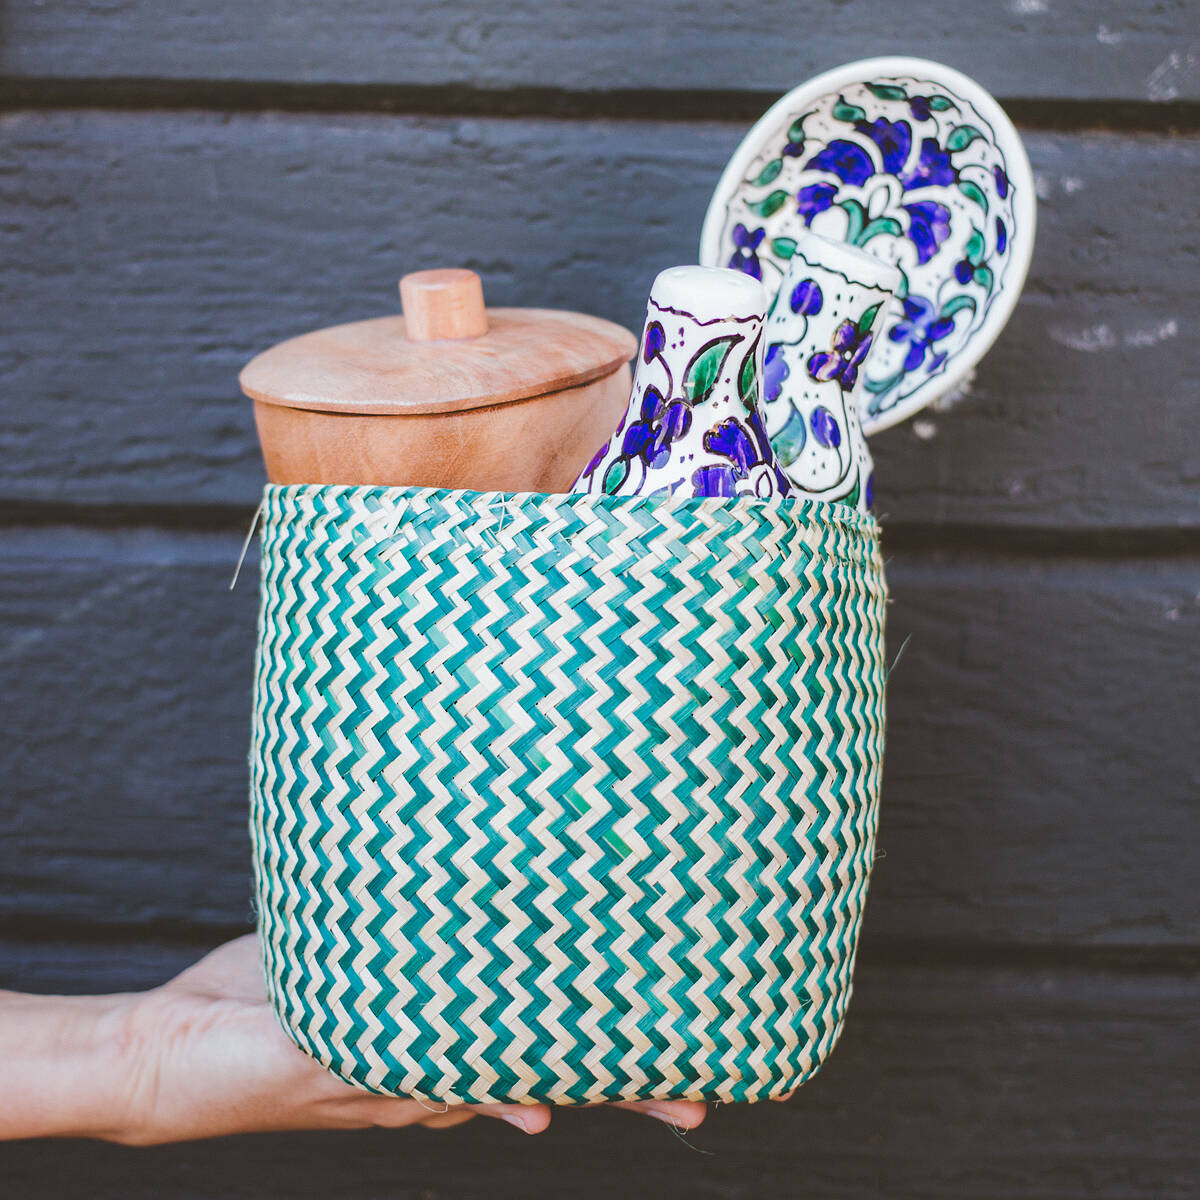 Savory Global Gift Basket | Handmade baskets, Ceramic spoon rest ...